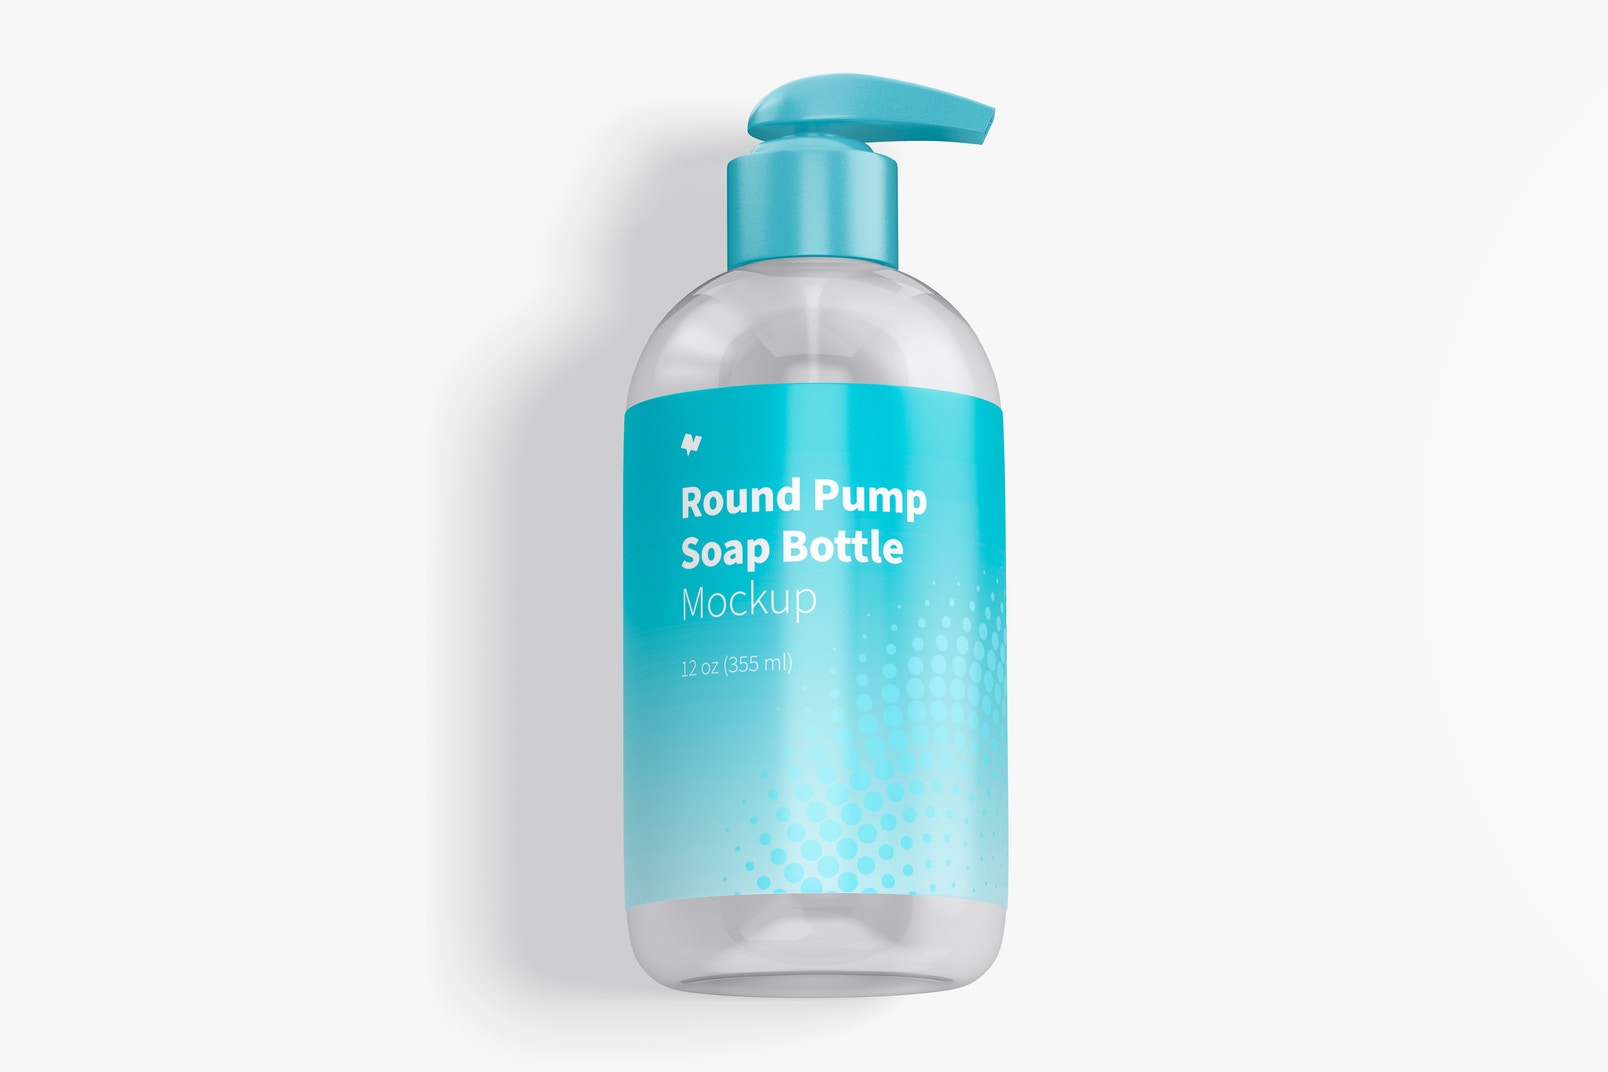 Round Pump Soap Bottle Mockup, Top View